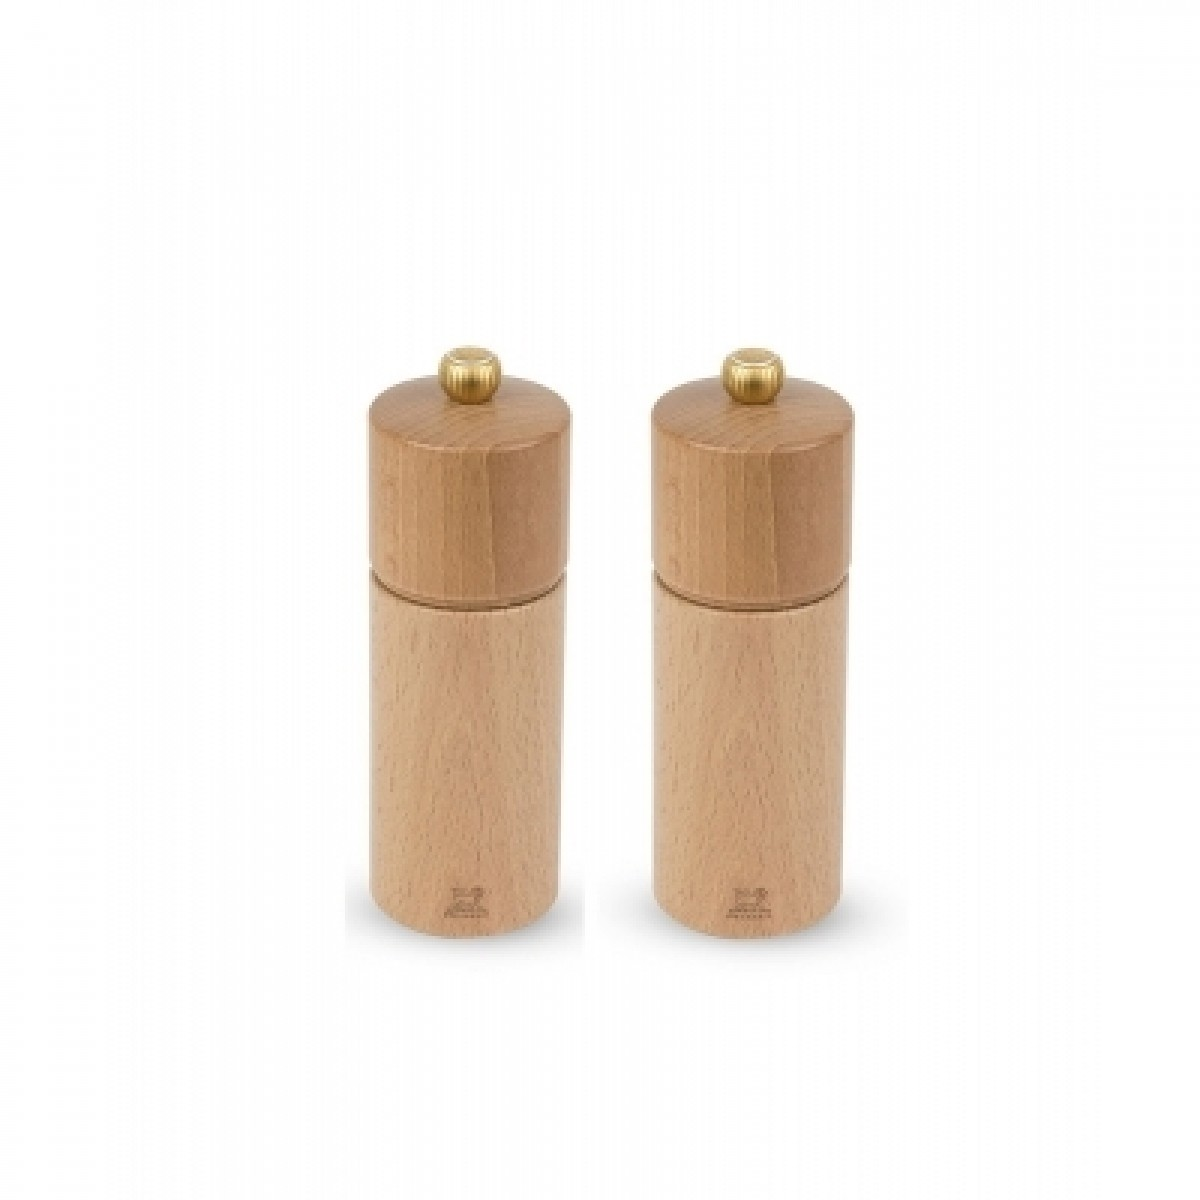 PEUGEOT Chatel salt & peberkværnsæt 16 cm - natur